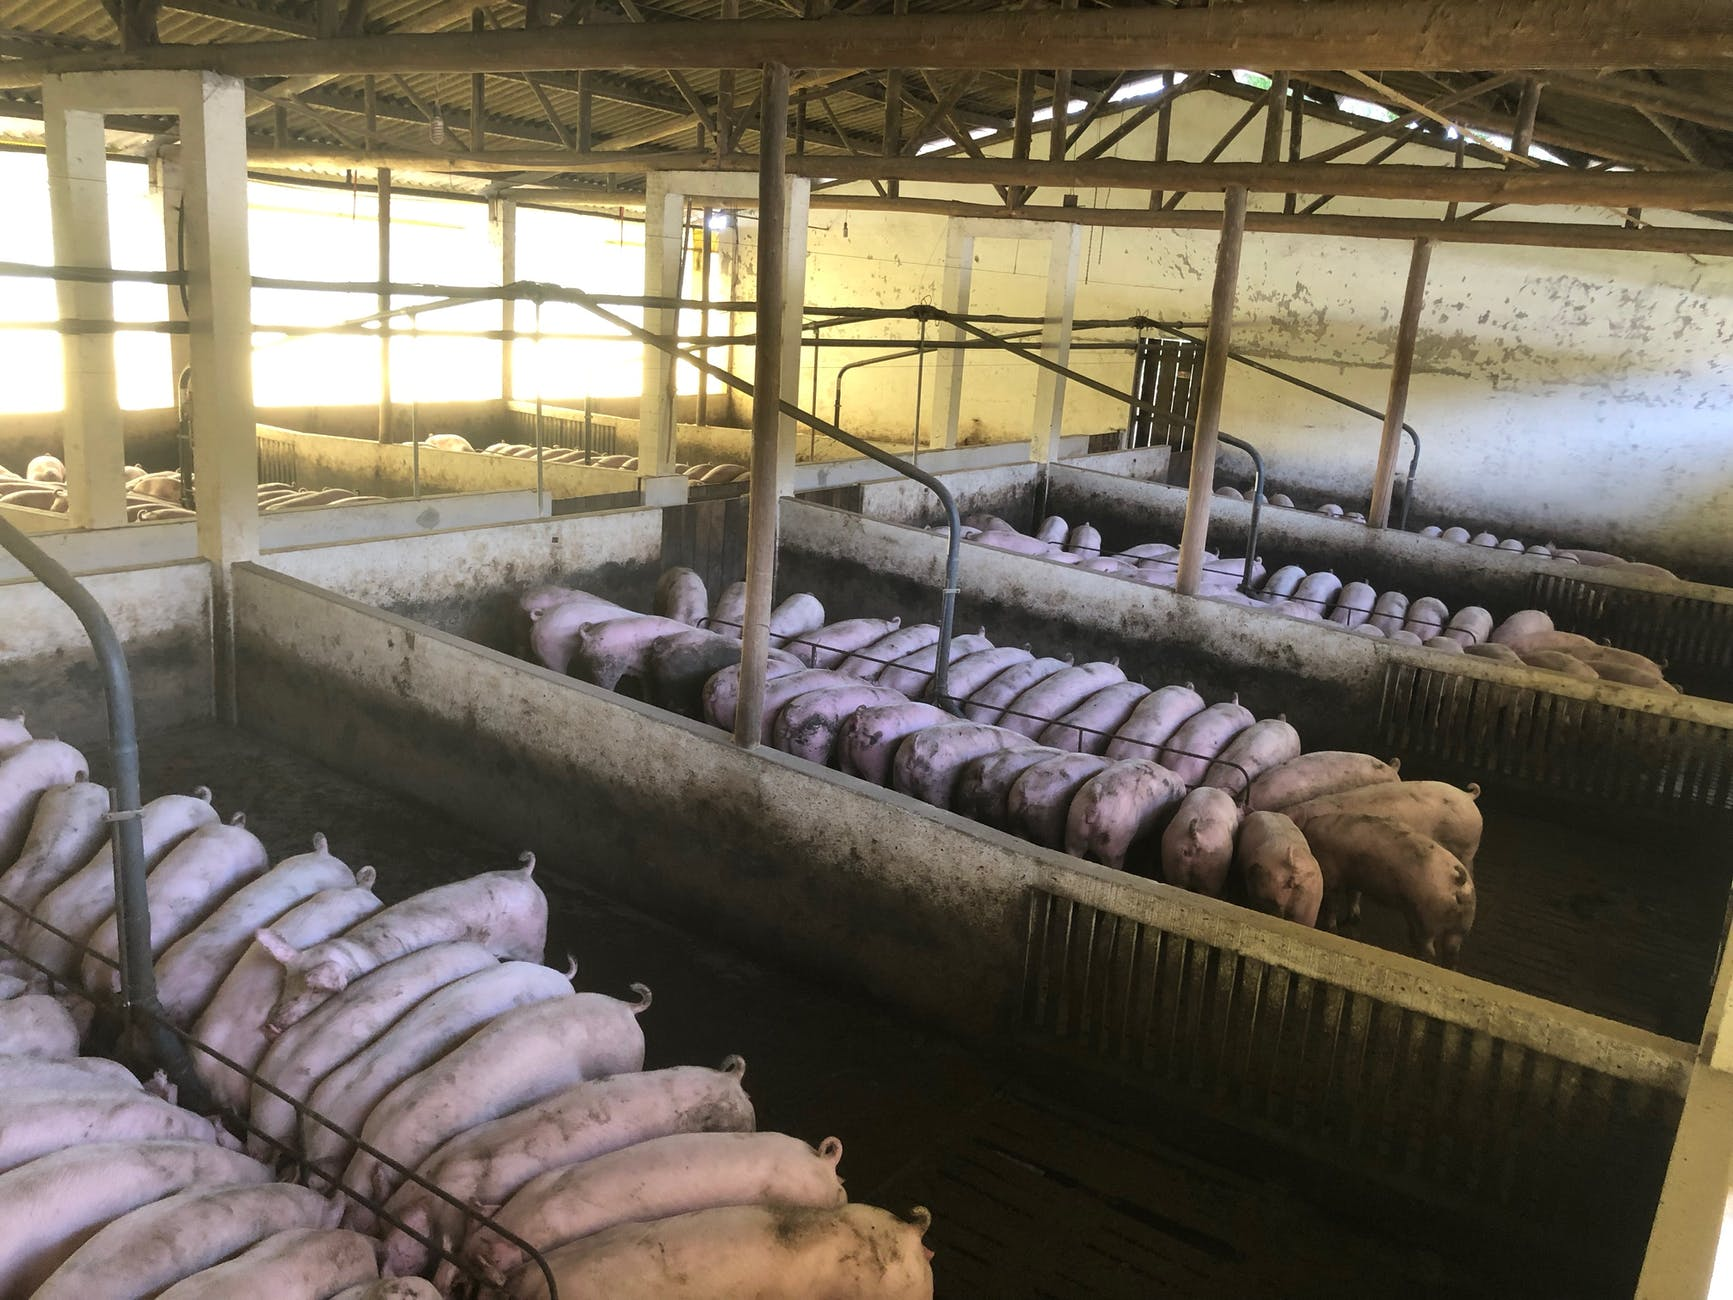 pigs feeding in spacious barn